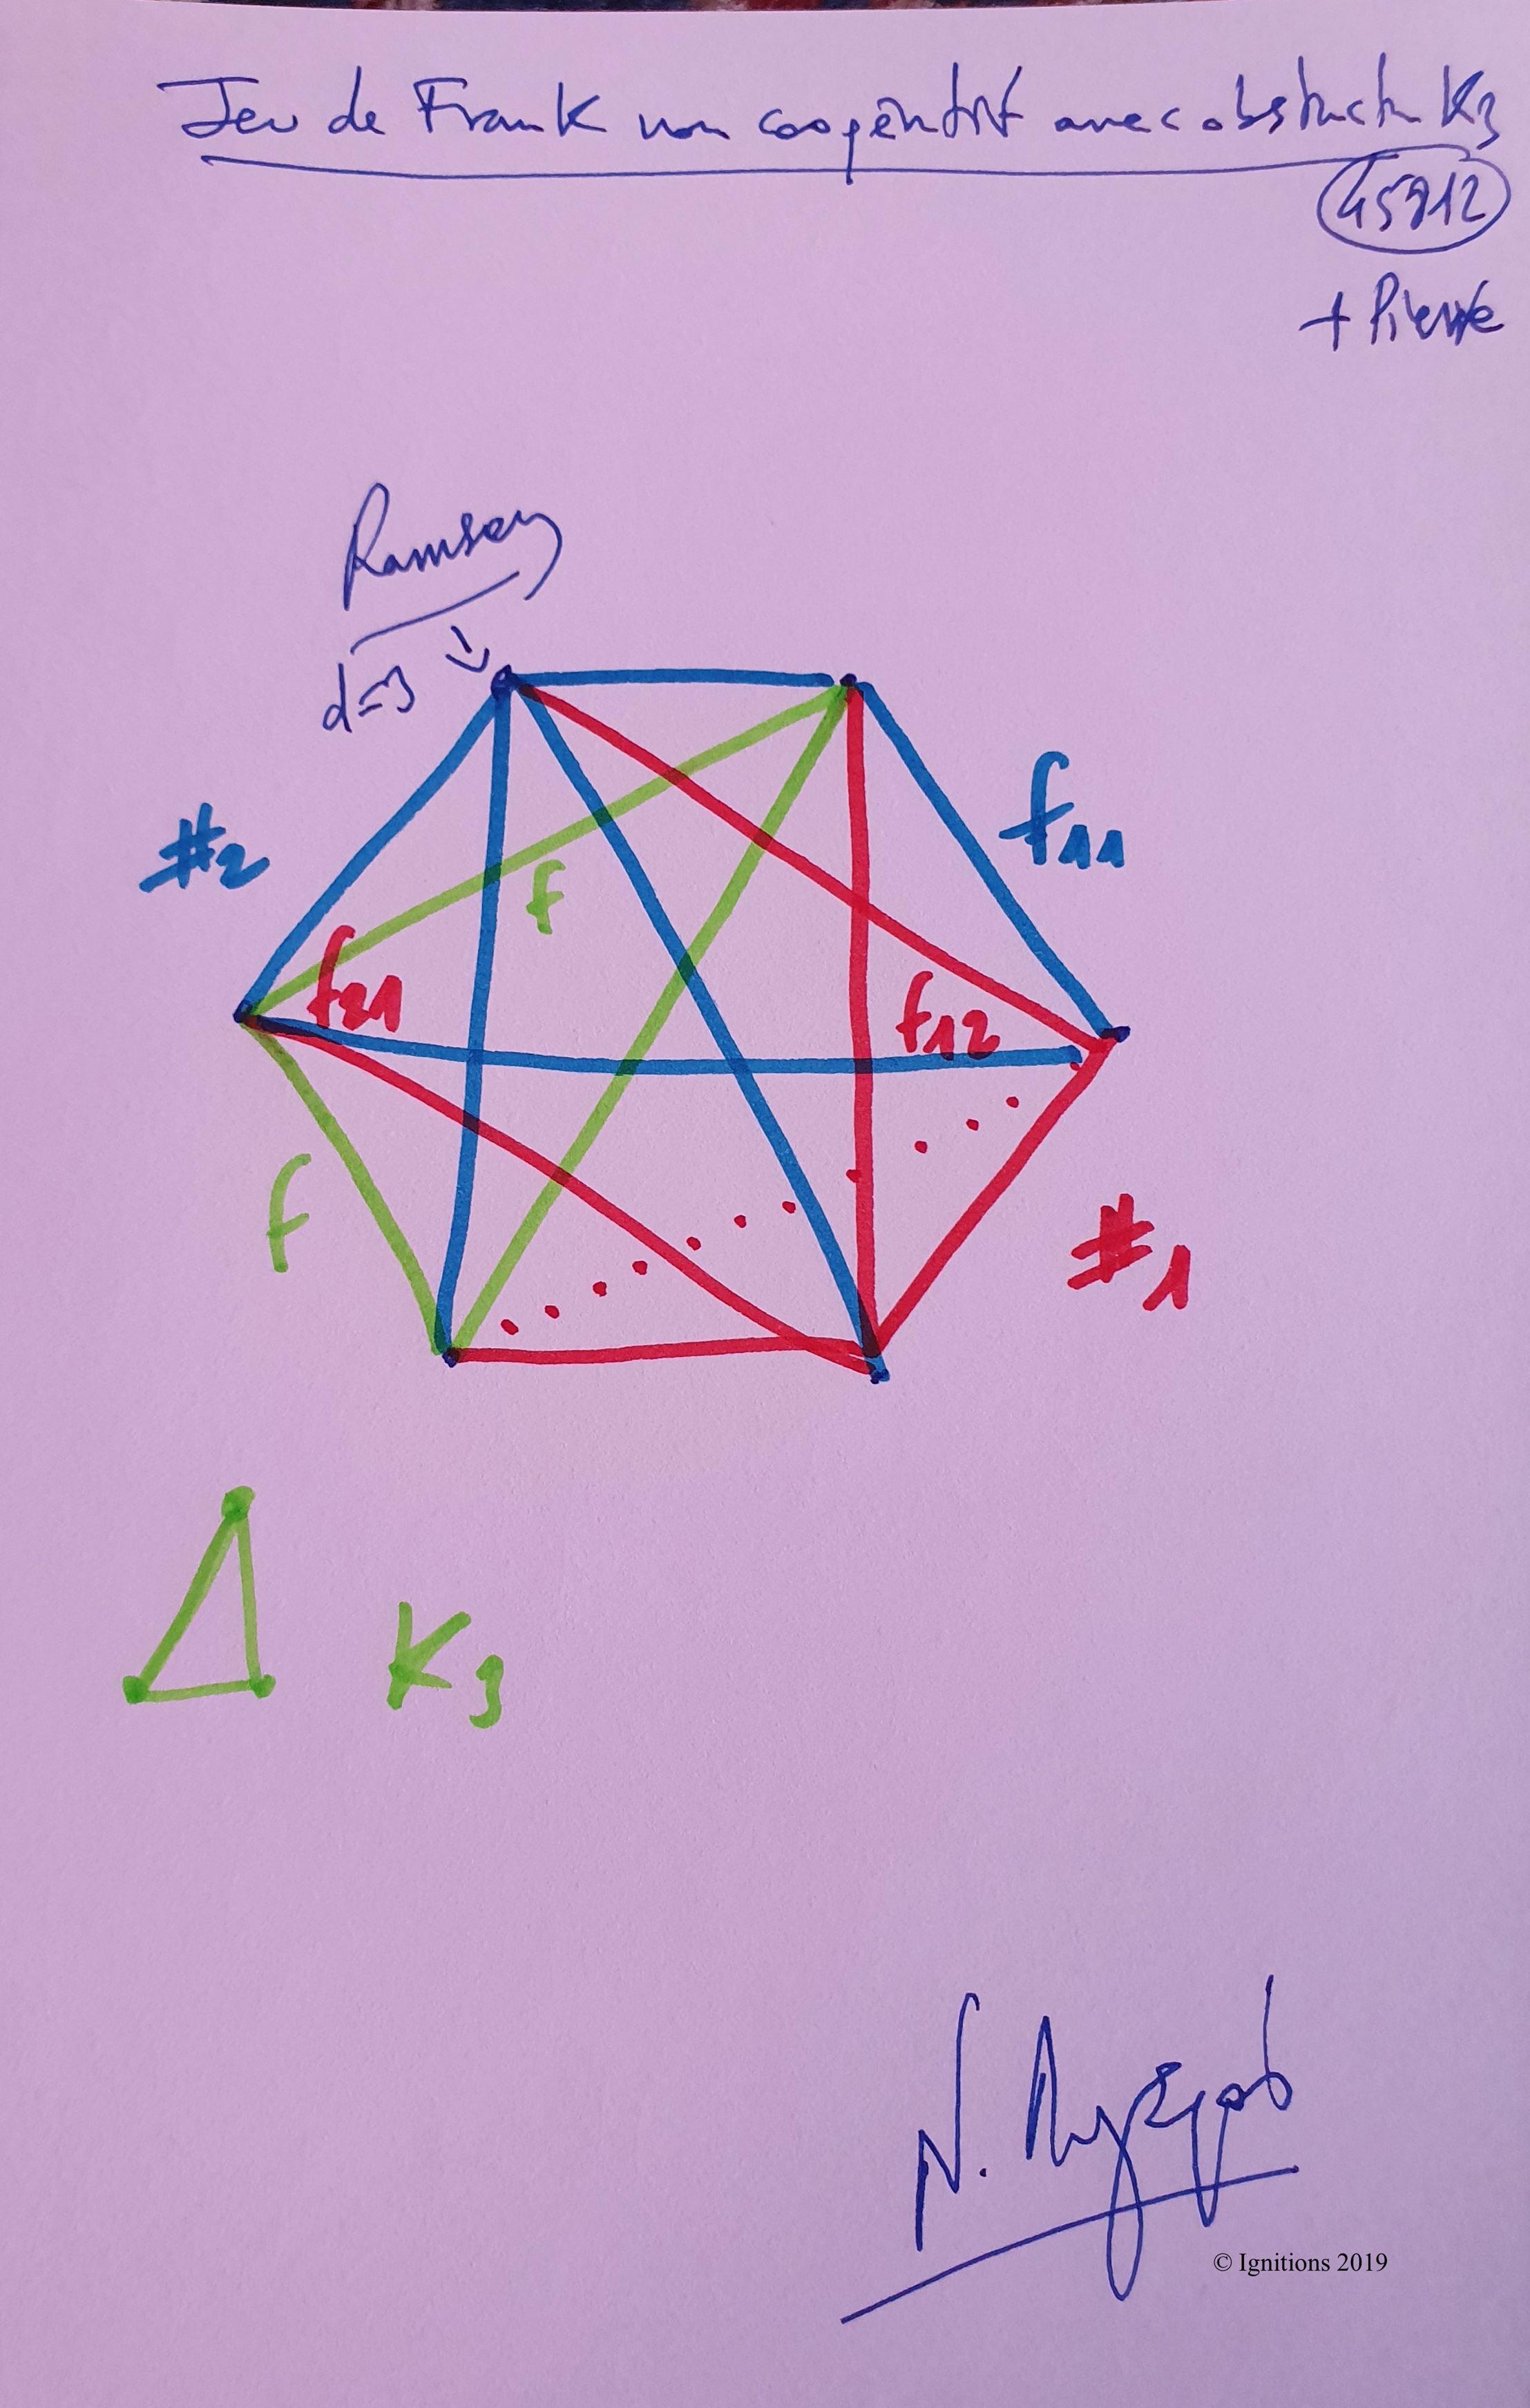 Jeu de Frank non coopératif avec obstruction K3. (avec P. Gazzano) (Dessin)